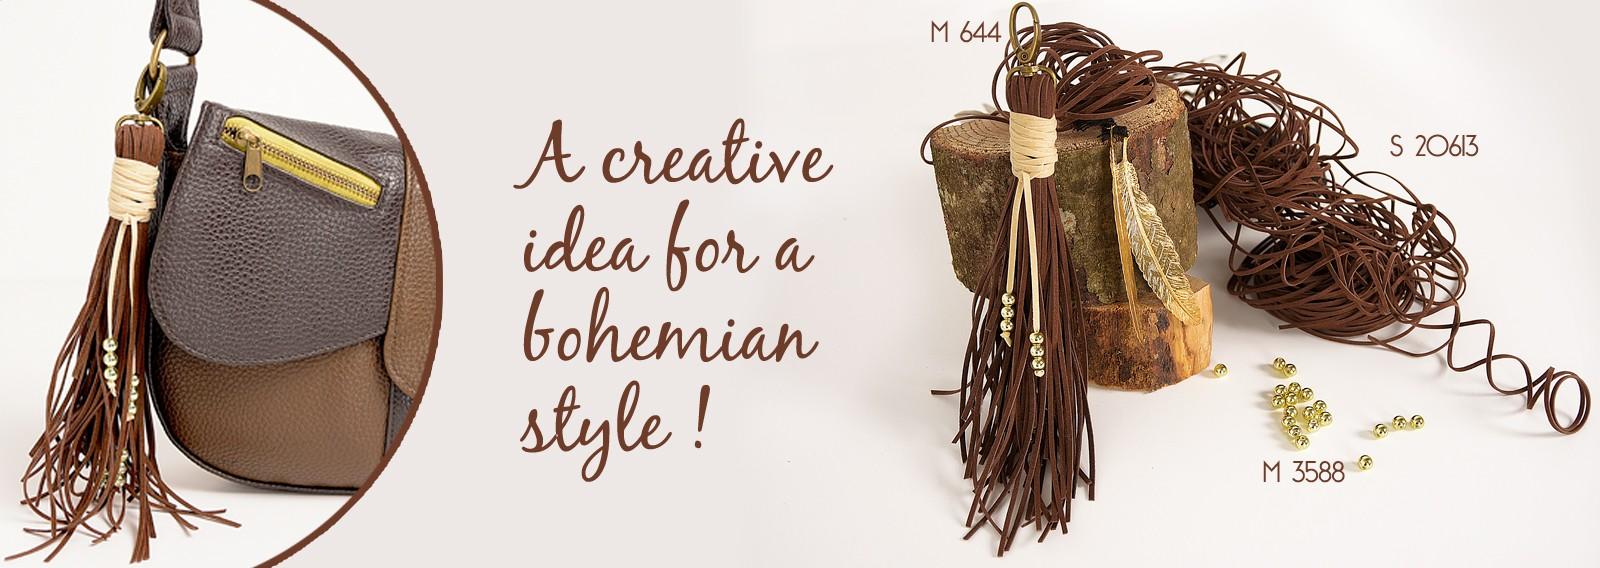 A creative idea for a bohemian style !